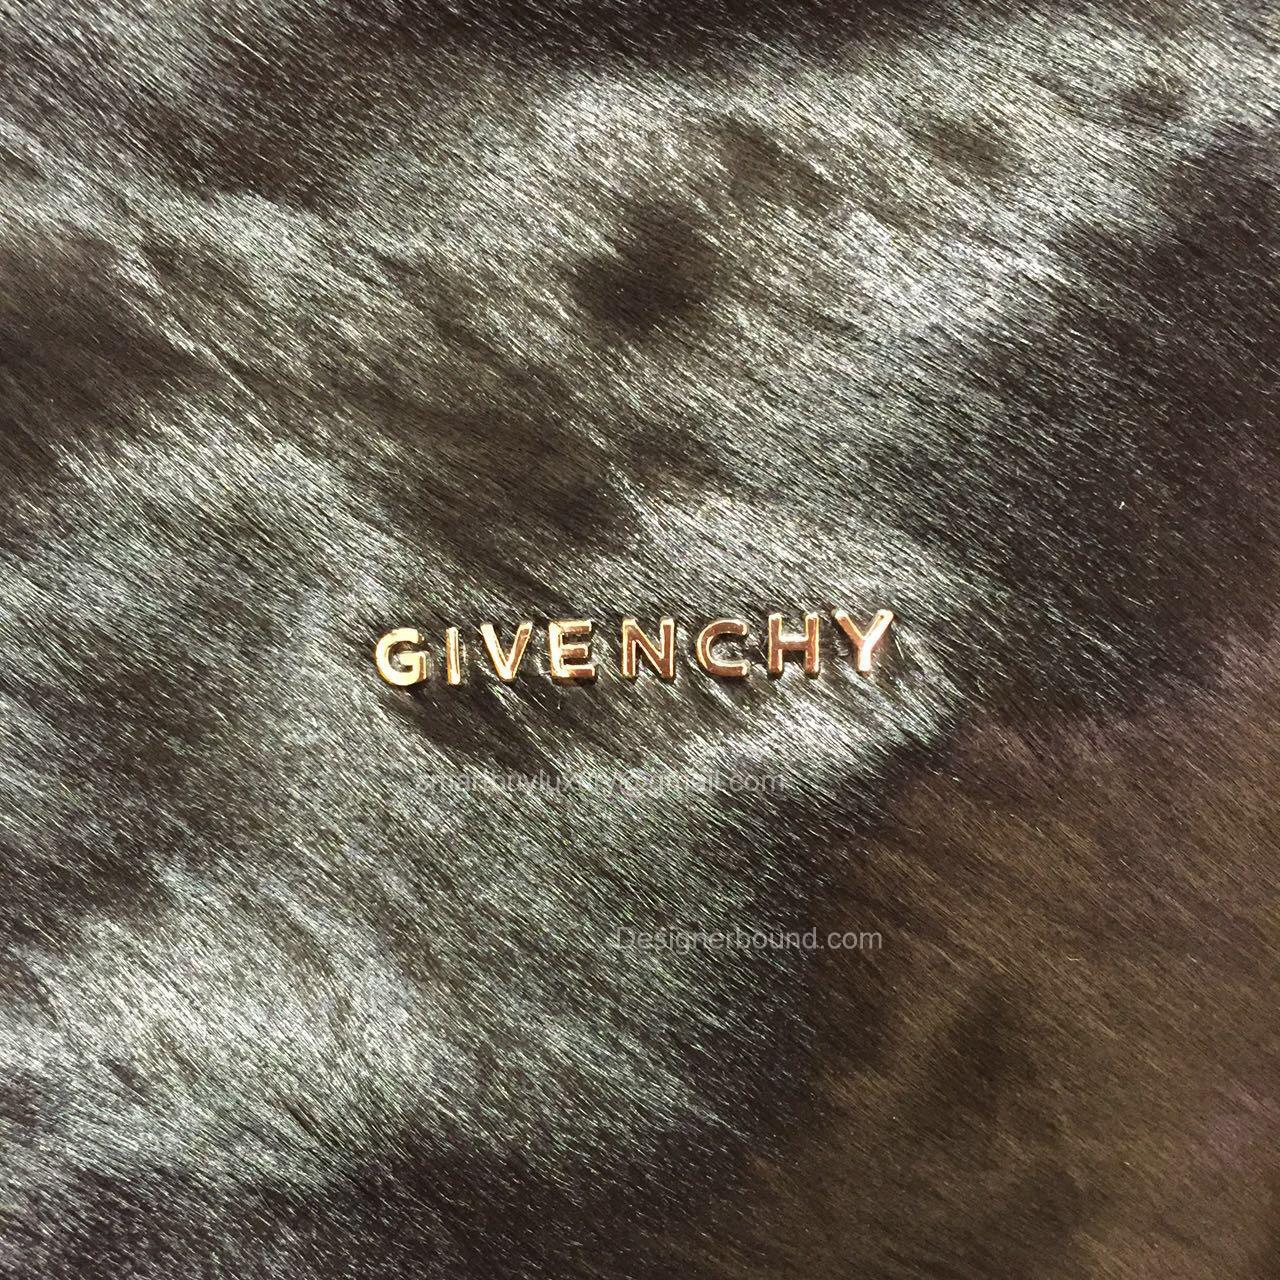 b288b2680318 Givenchy Large Pandora Black Bag with Pony Hair 285165. GIVENCHY ...